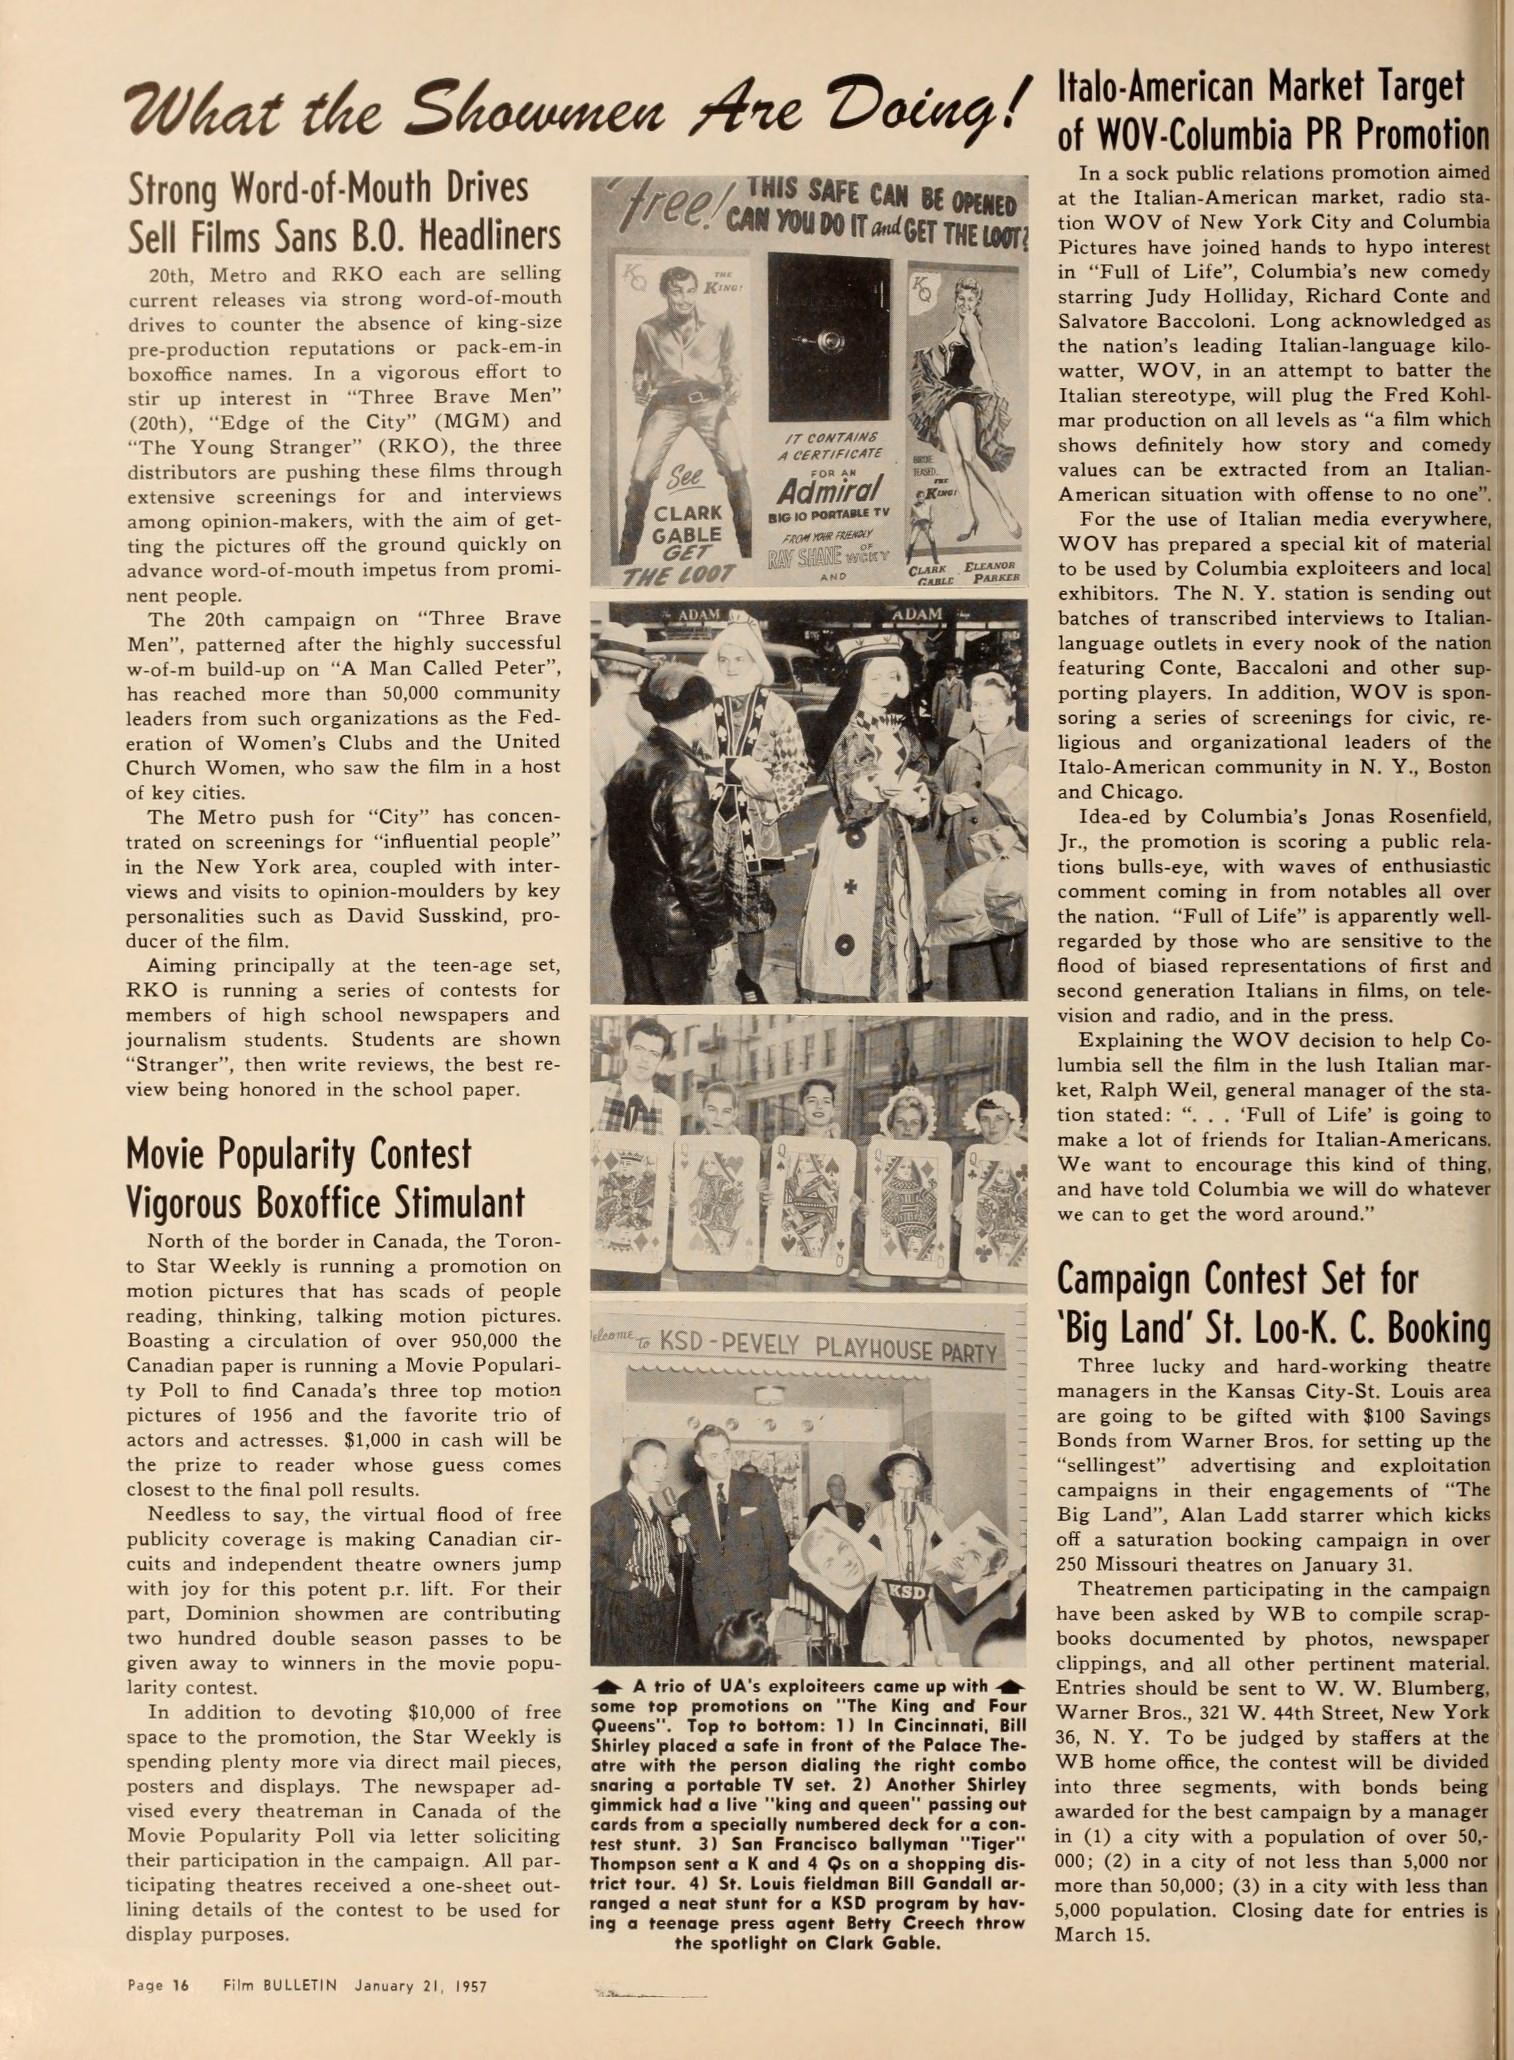 Filmbulletin195725film_jp2.zip&file=filmbulletin195725film_jp2%2ffilmbulletin195725film_0046